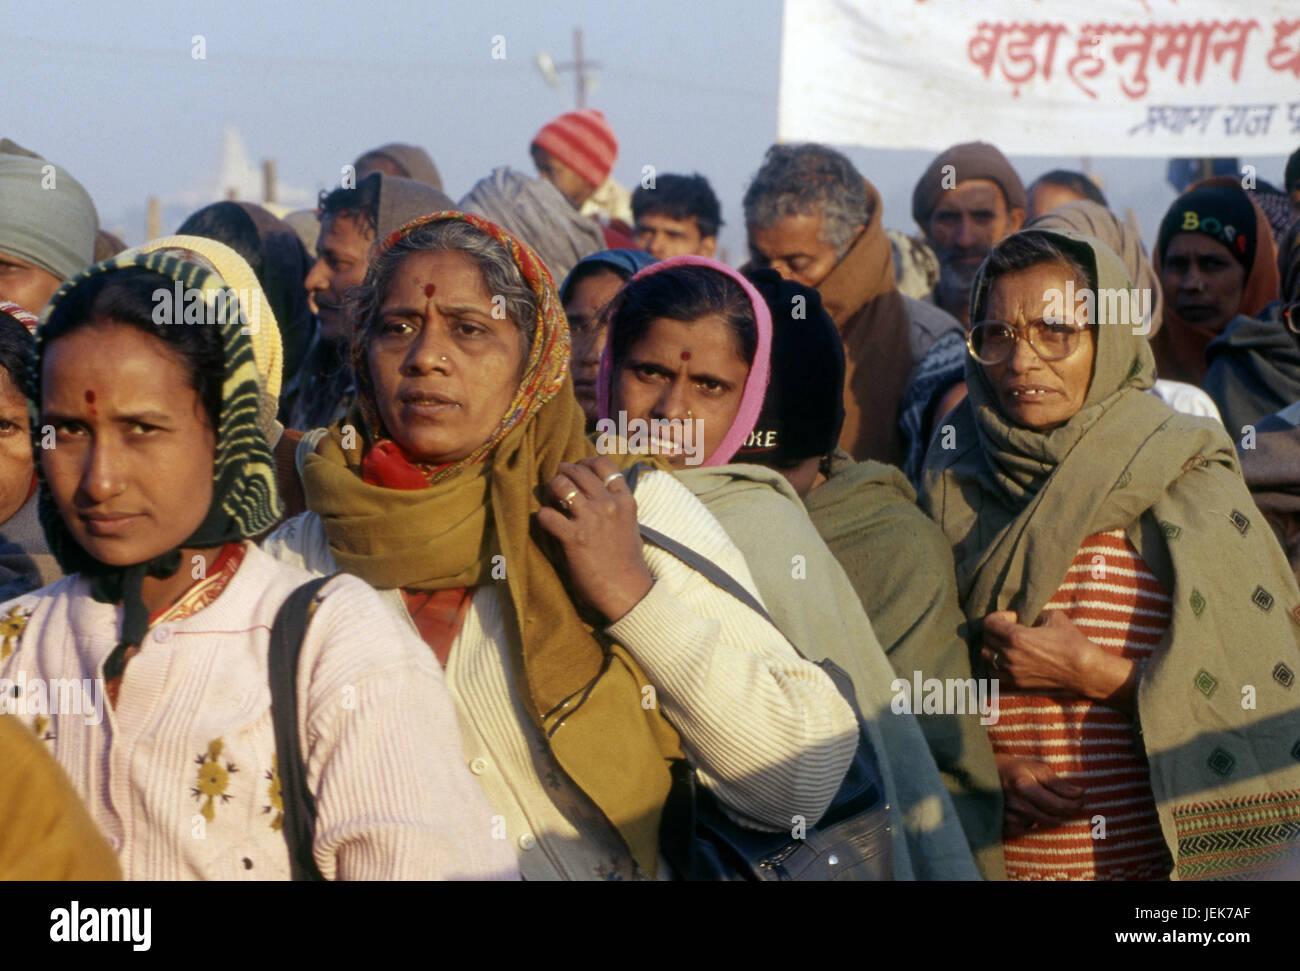 Pilgrimage kumbh mela festival, Allahabad, uttar pradesh, india, asia - Stock Image